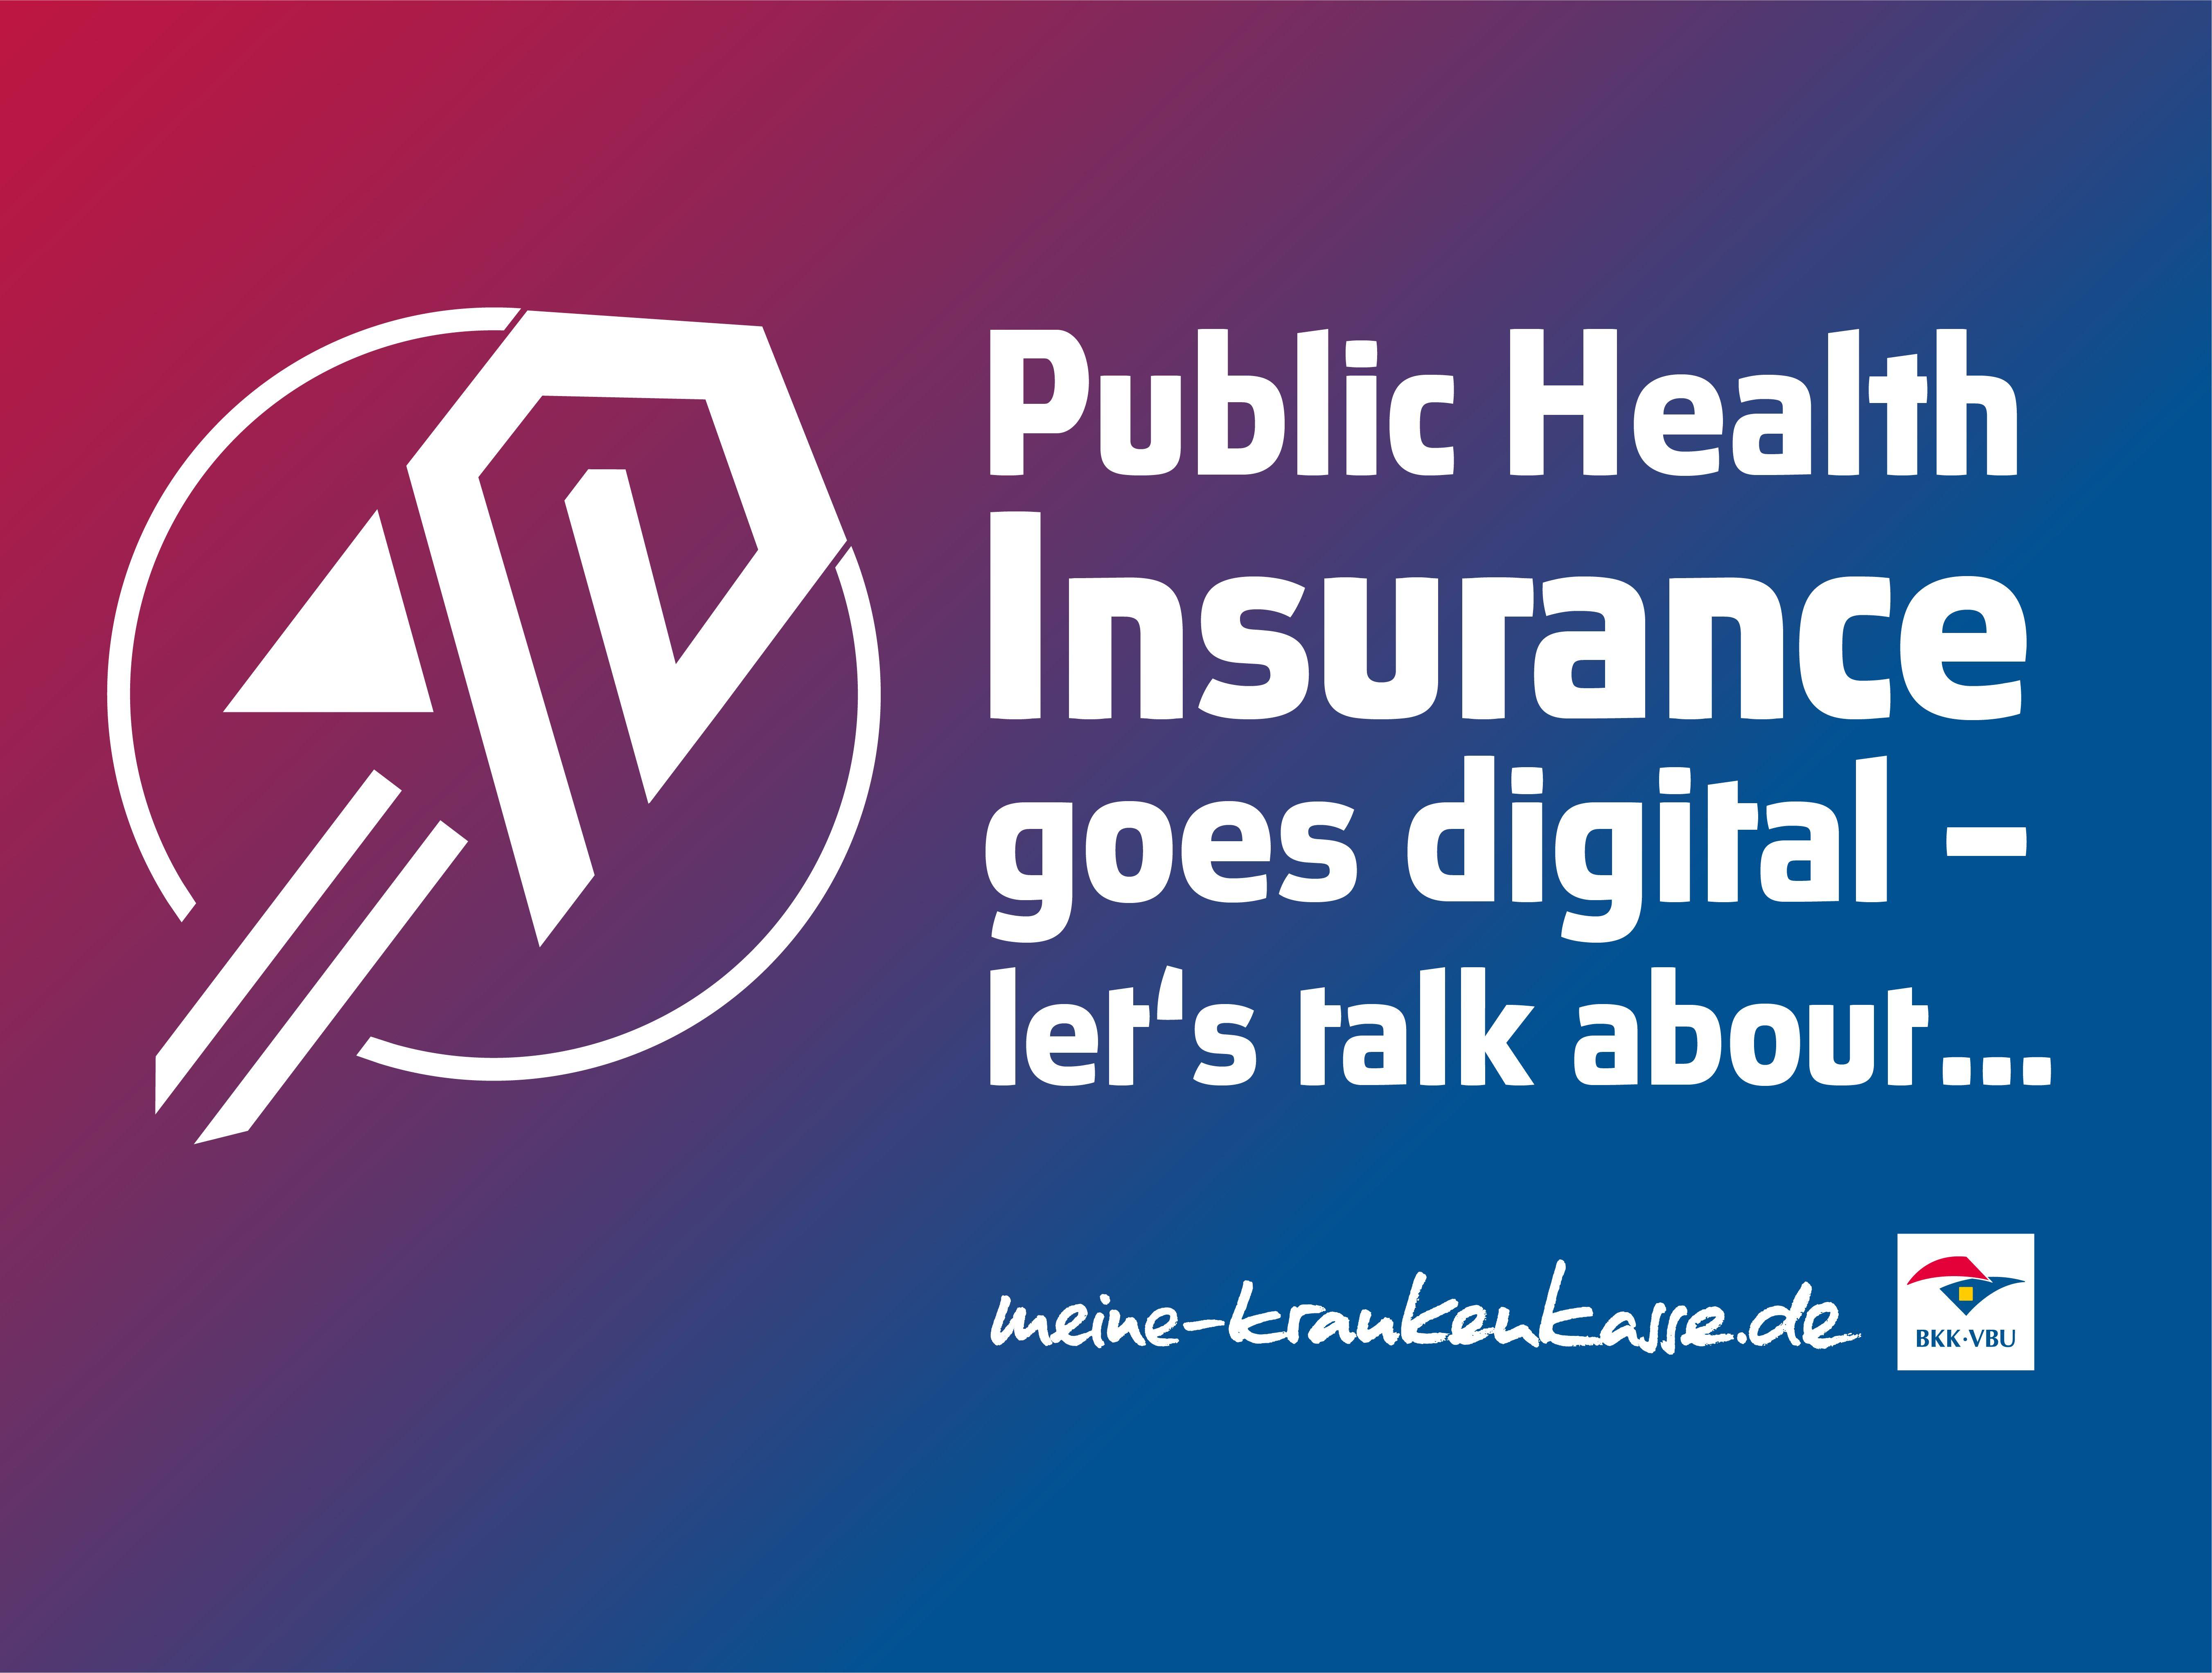 Public Health Insurance goes Digital –  Let's talk about...